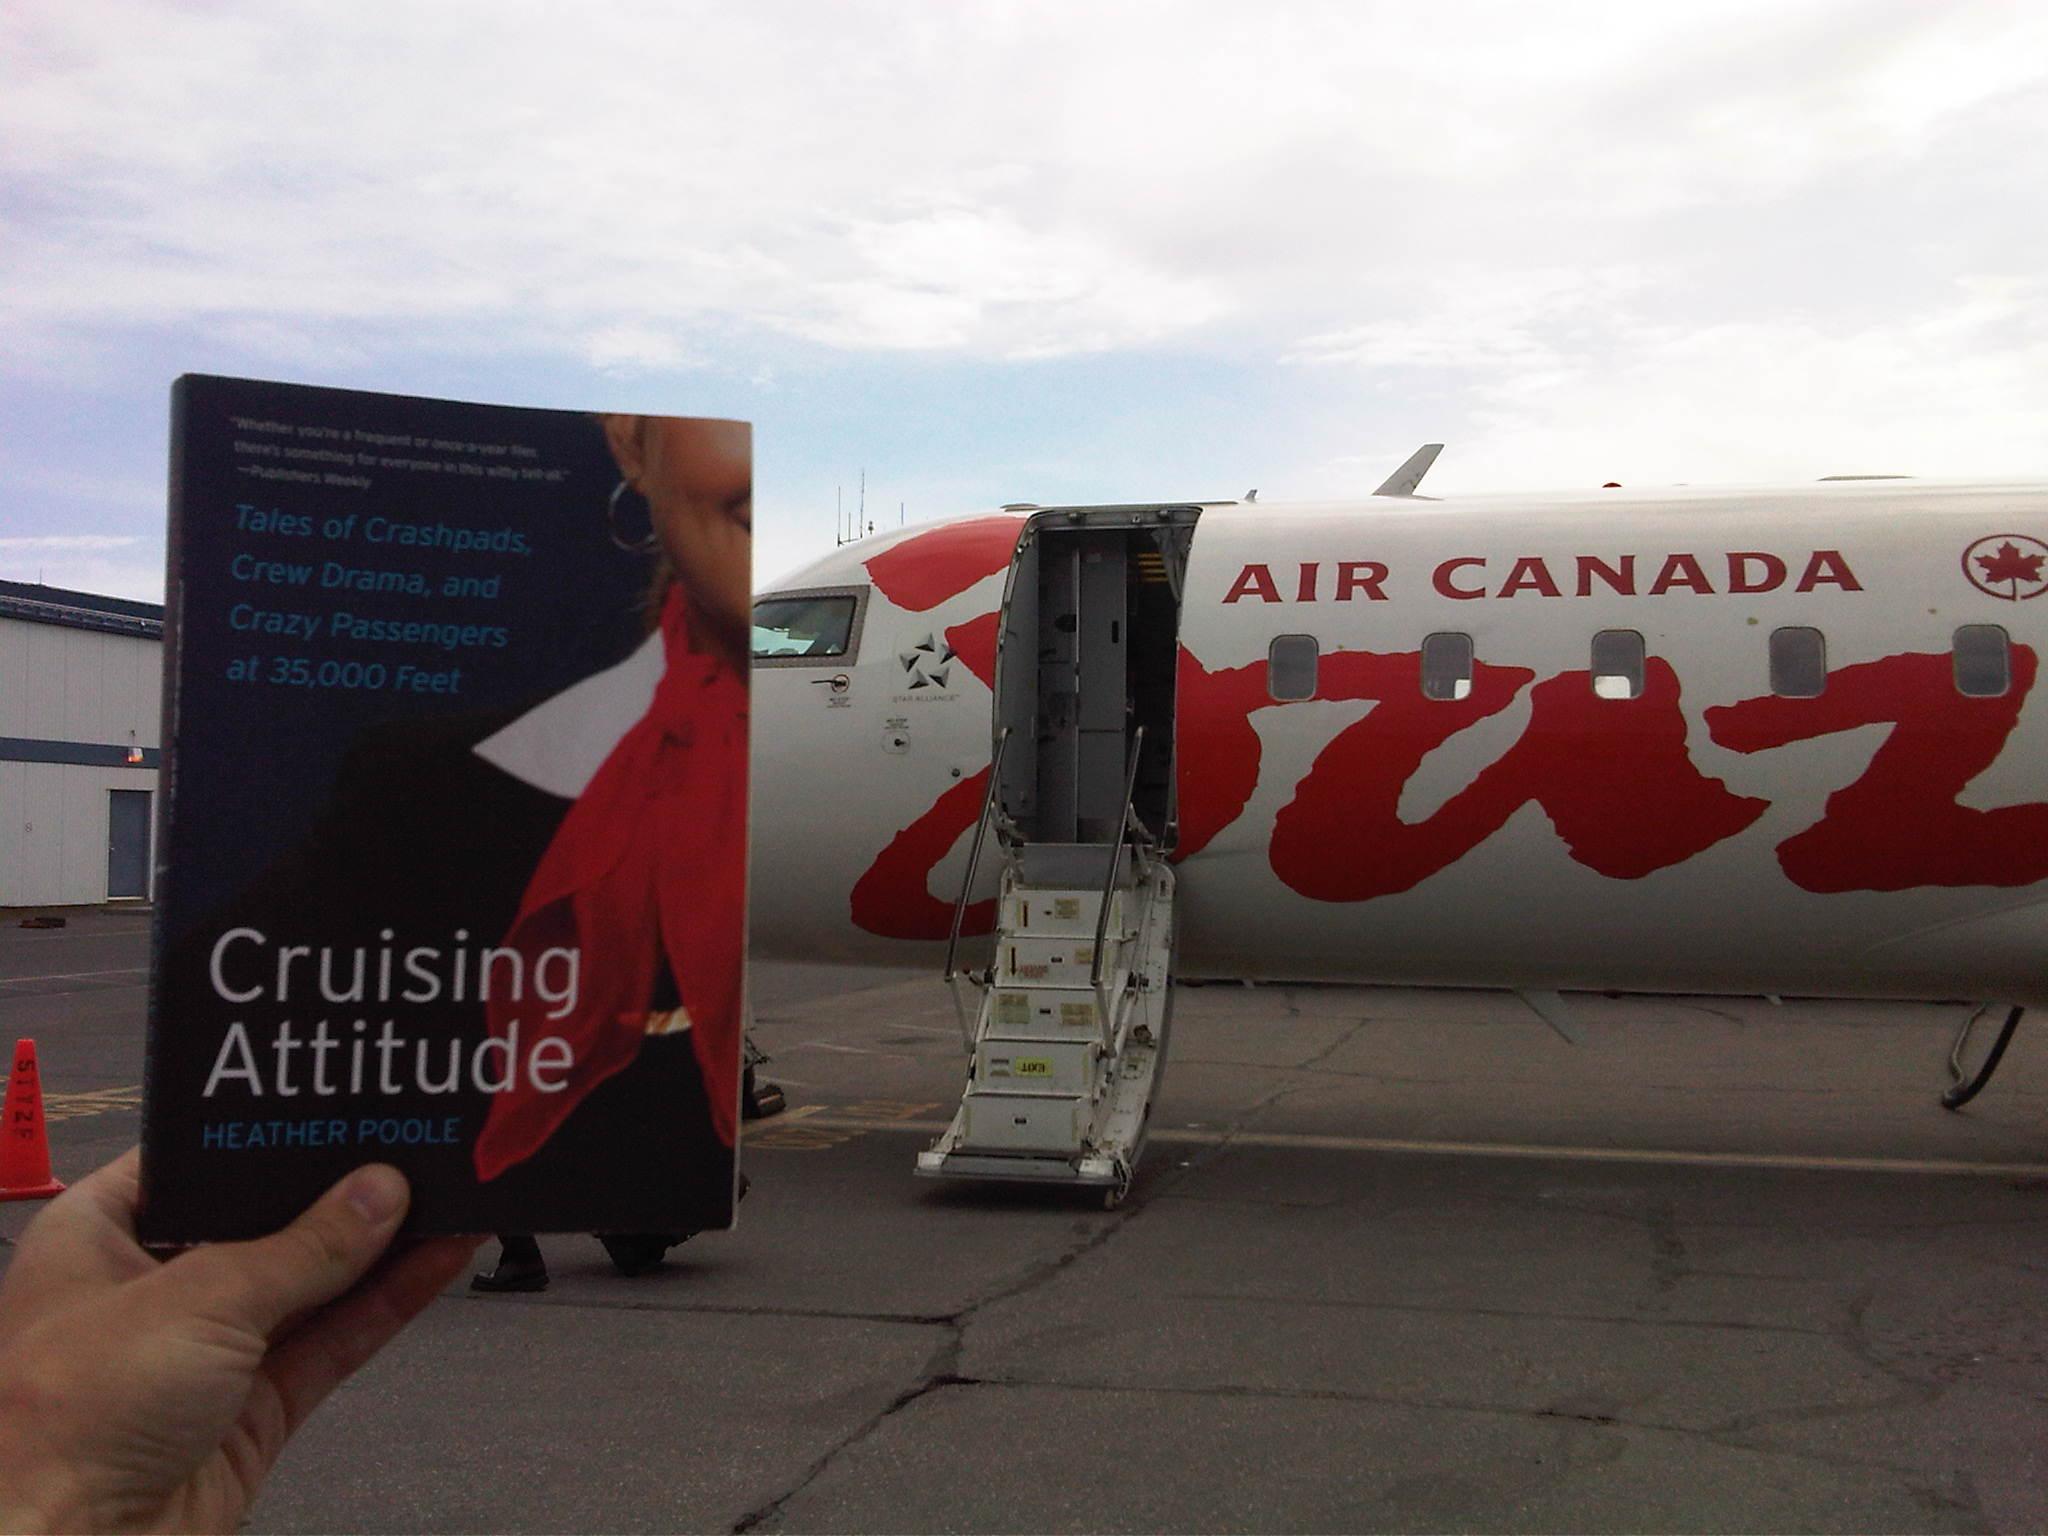 air canada jazz flight crew shows off their cruising attitude